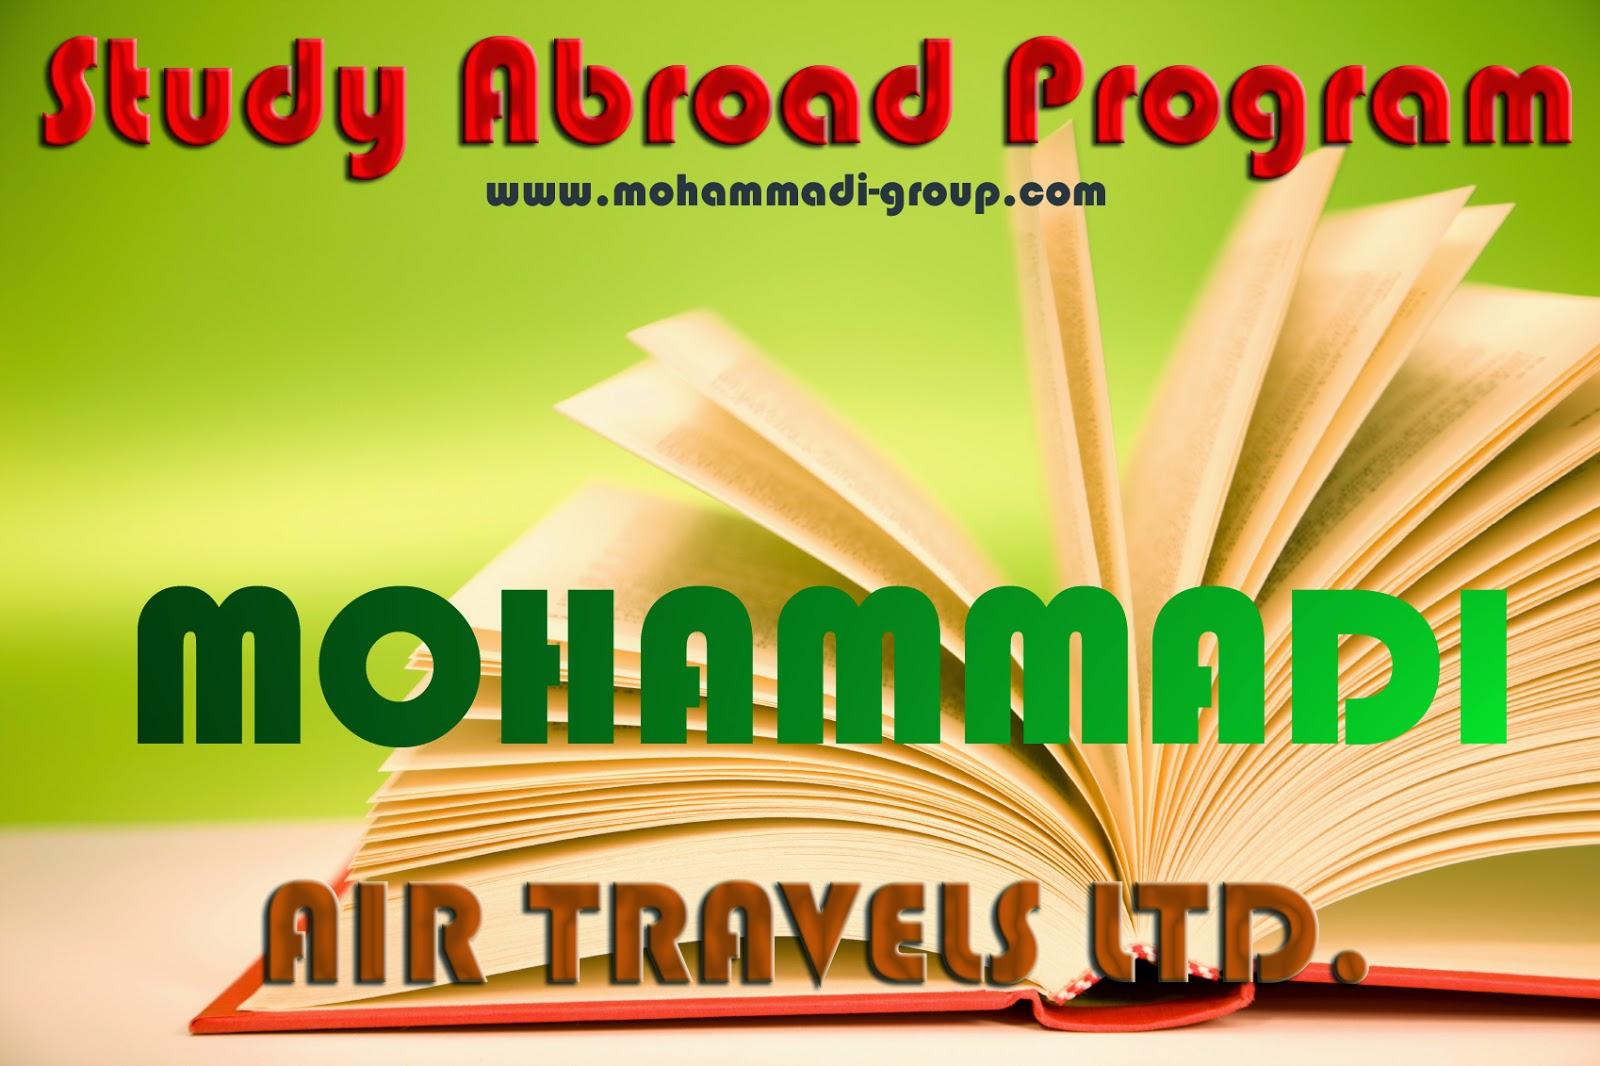 Nazreen oroni - Consultant - MIM Study Abroad | LinkedIn